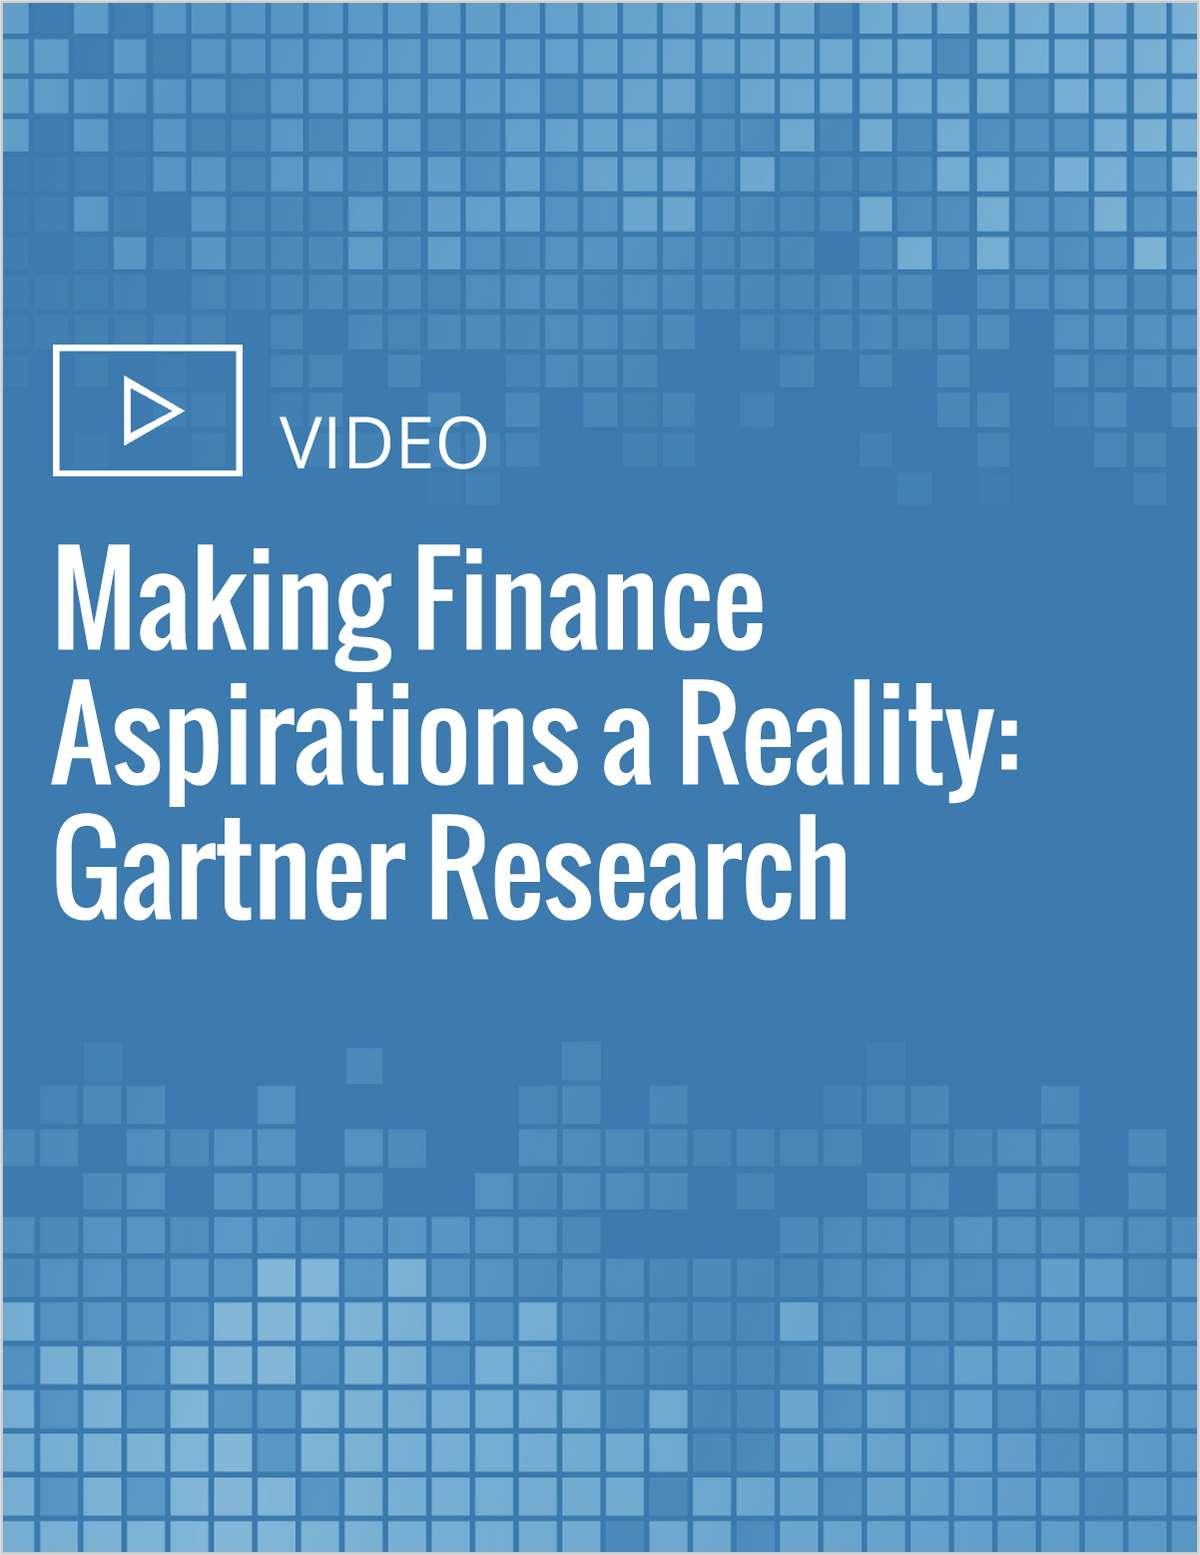 Making Finance Aspirations a Reality: Gartner Research